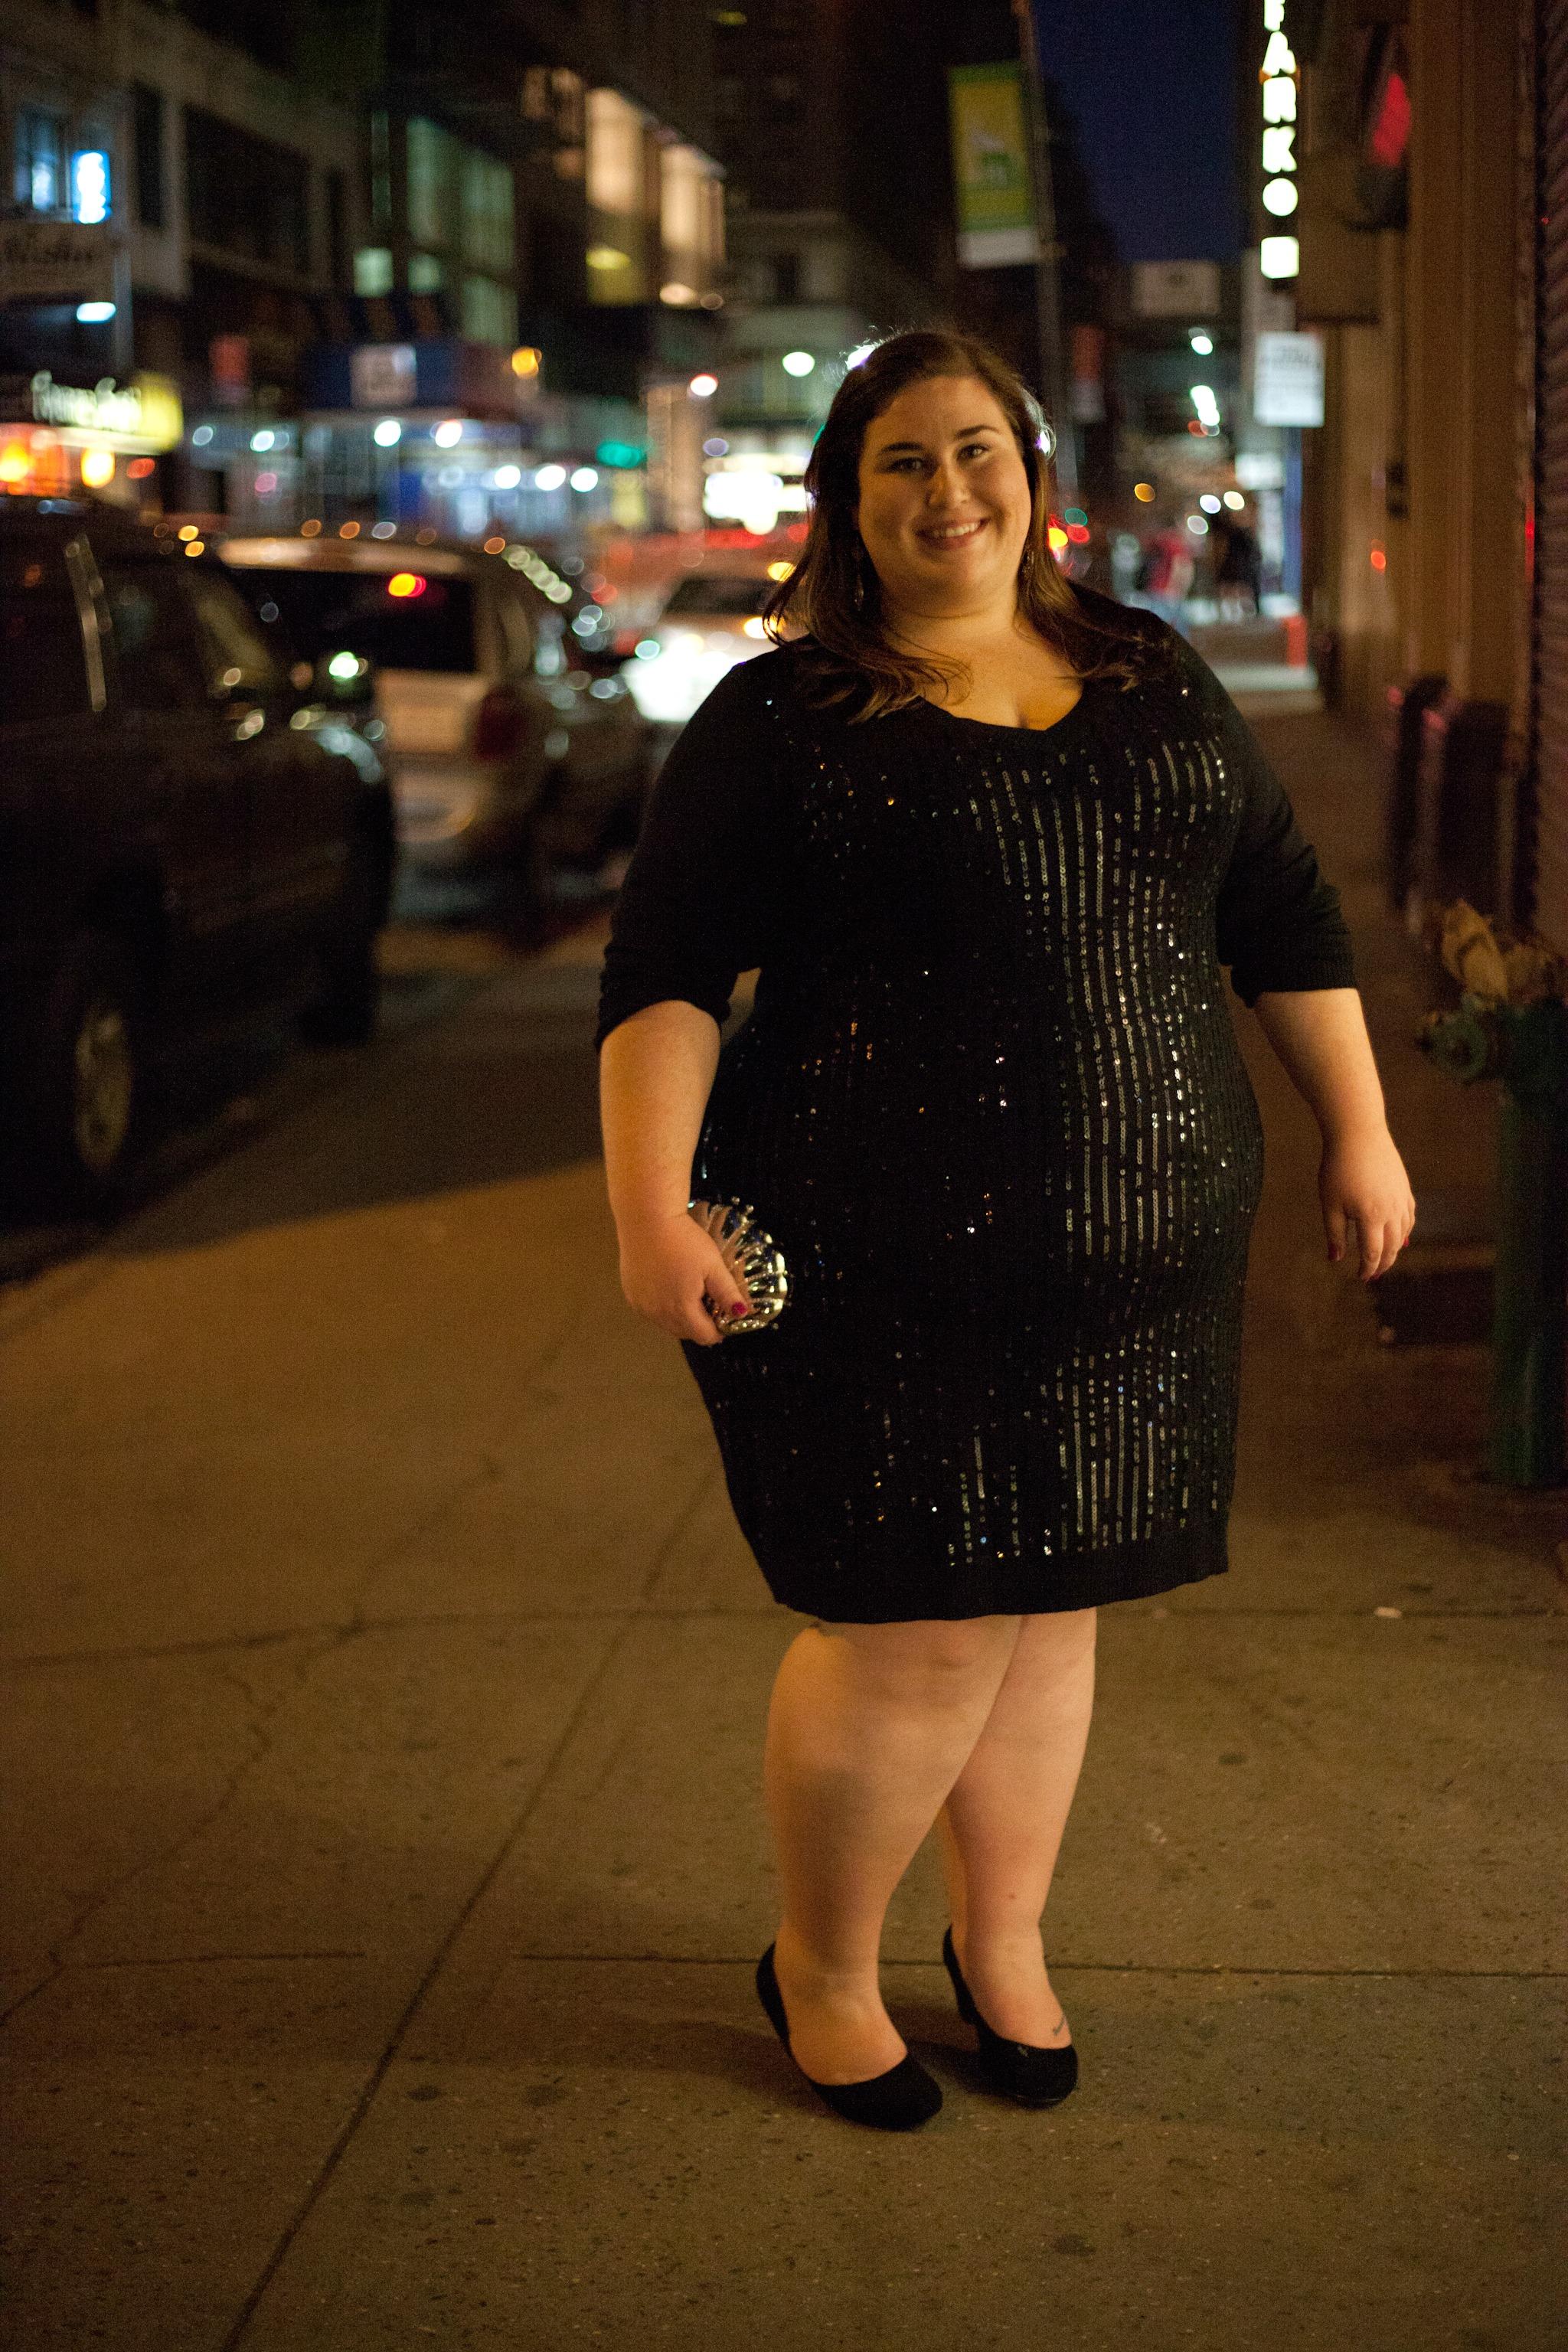 plus size cruise wear dresses - gaussianblur